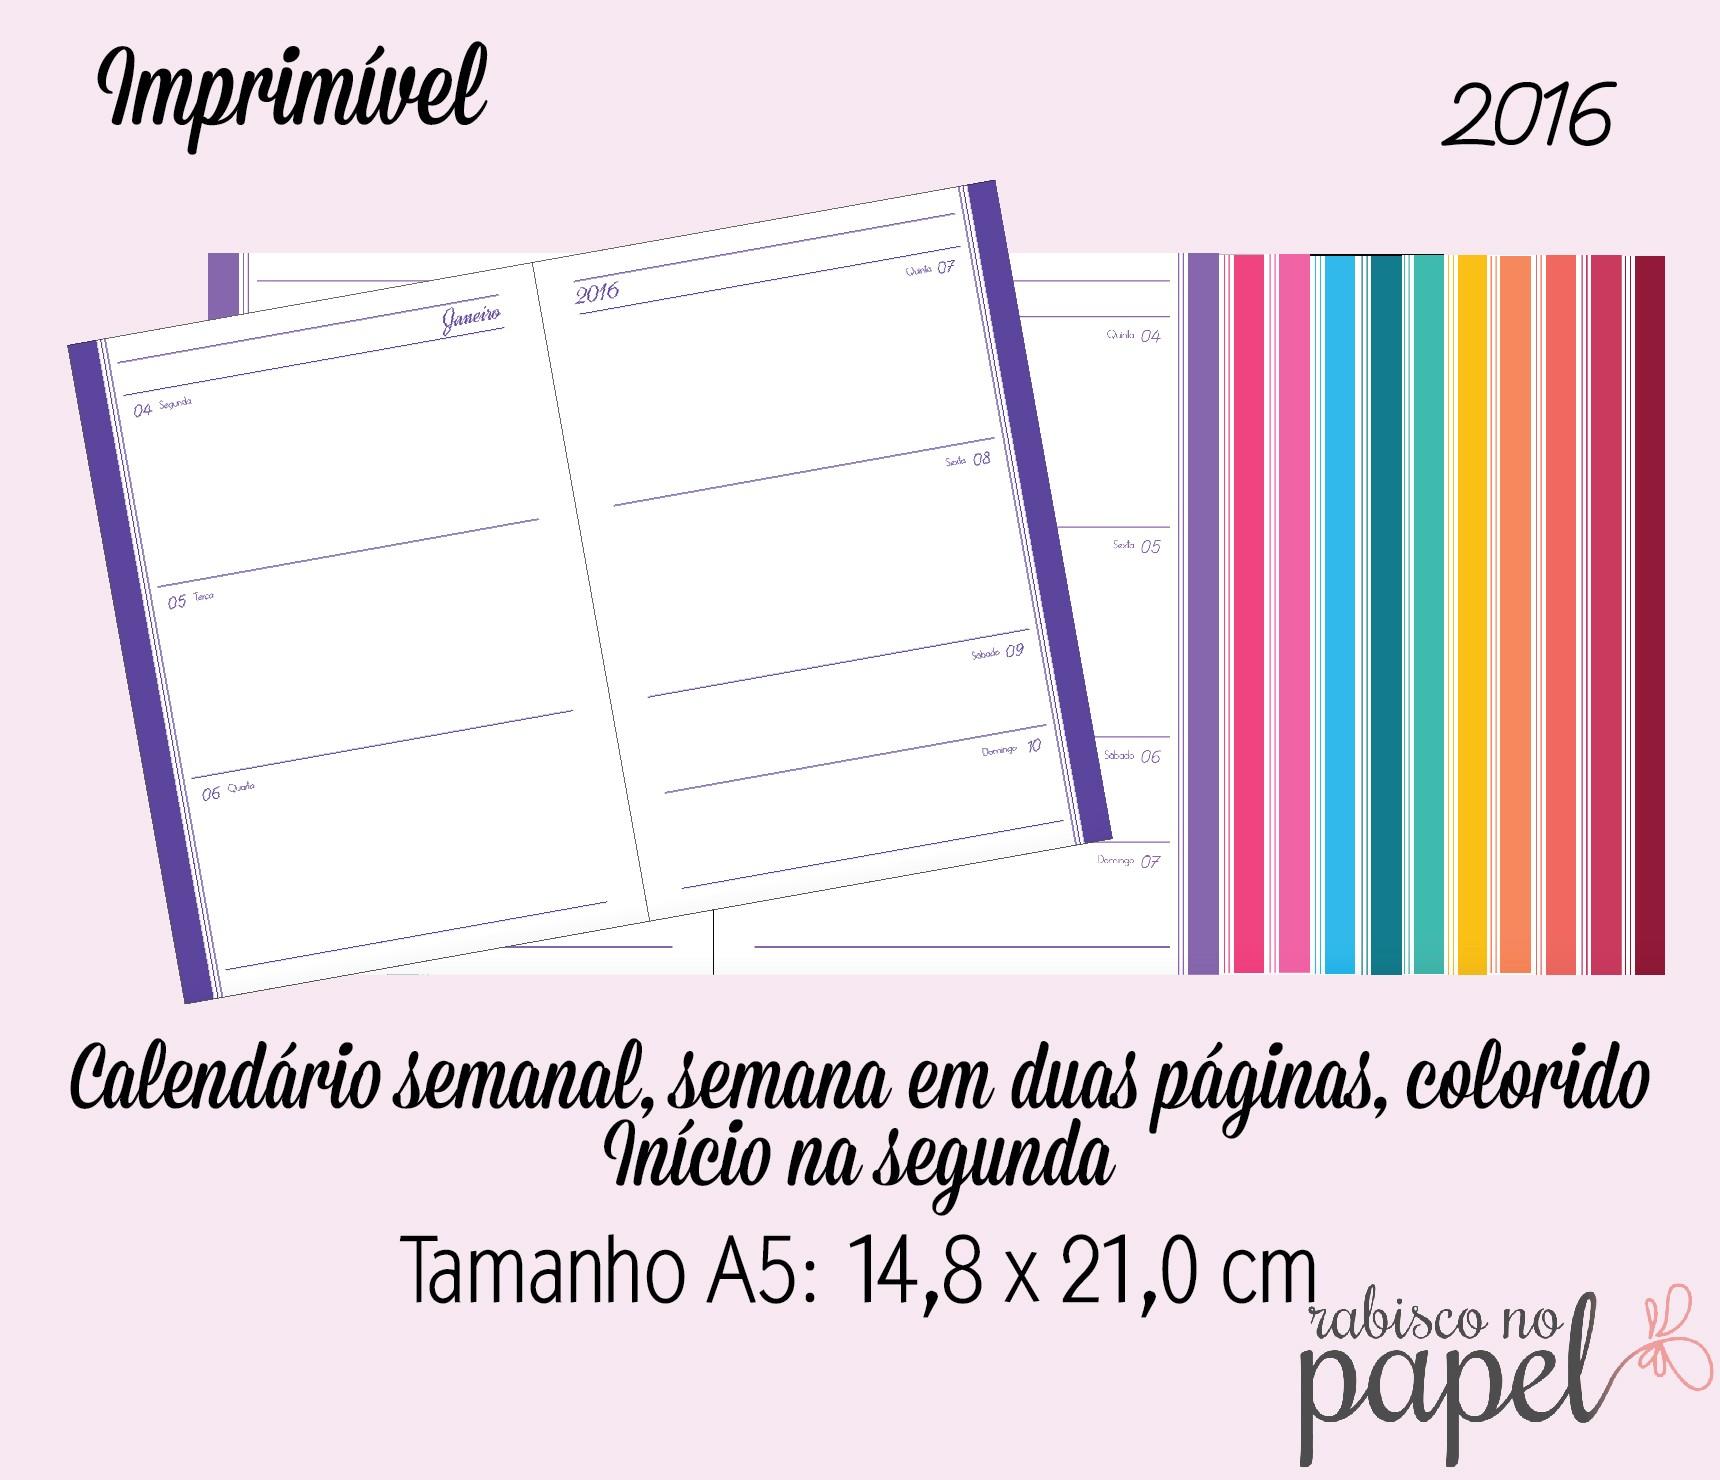 imprimivel agenda semanal 201 a5 sem pauta